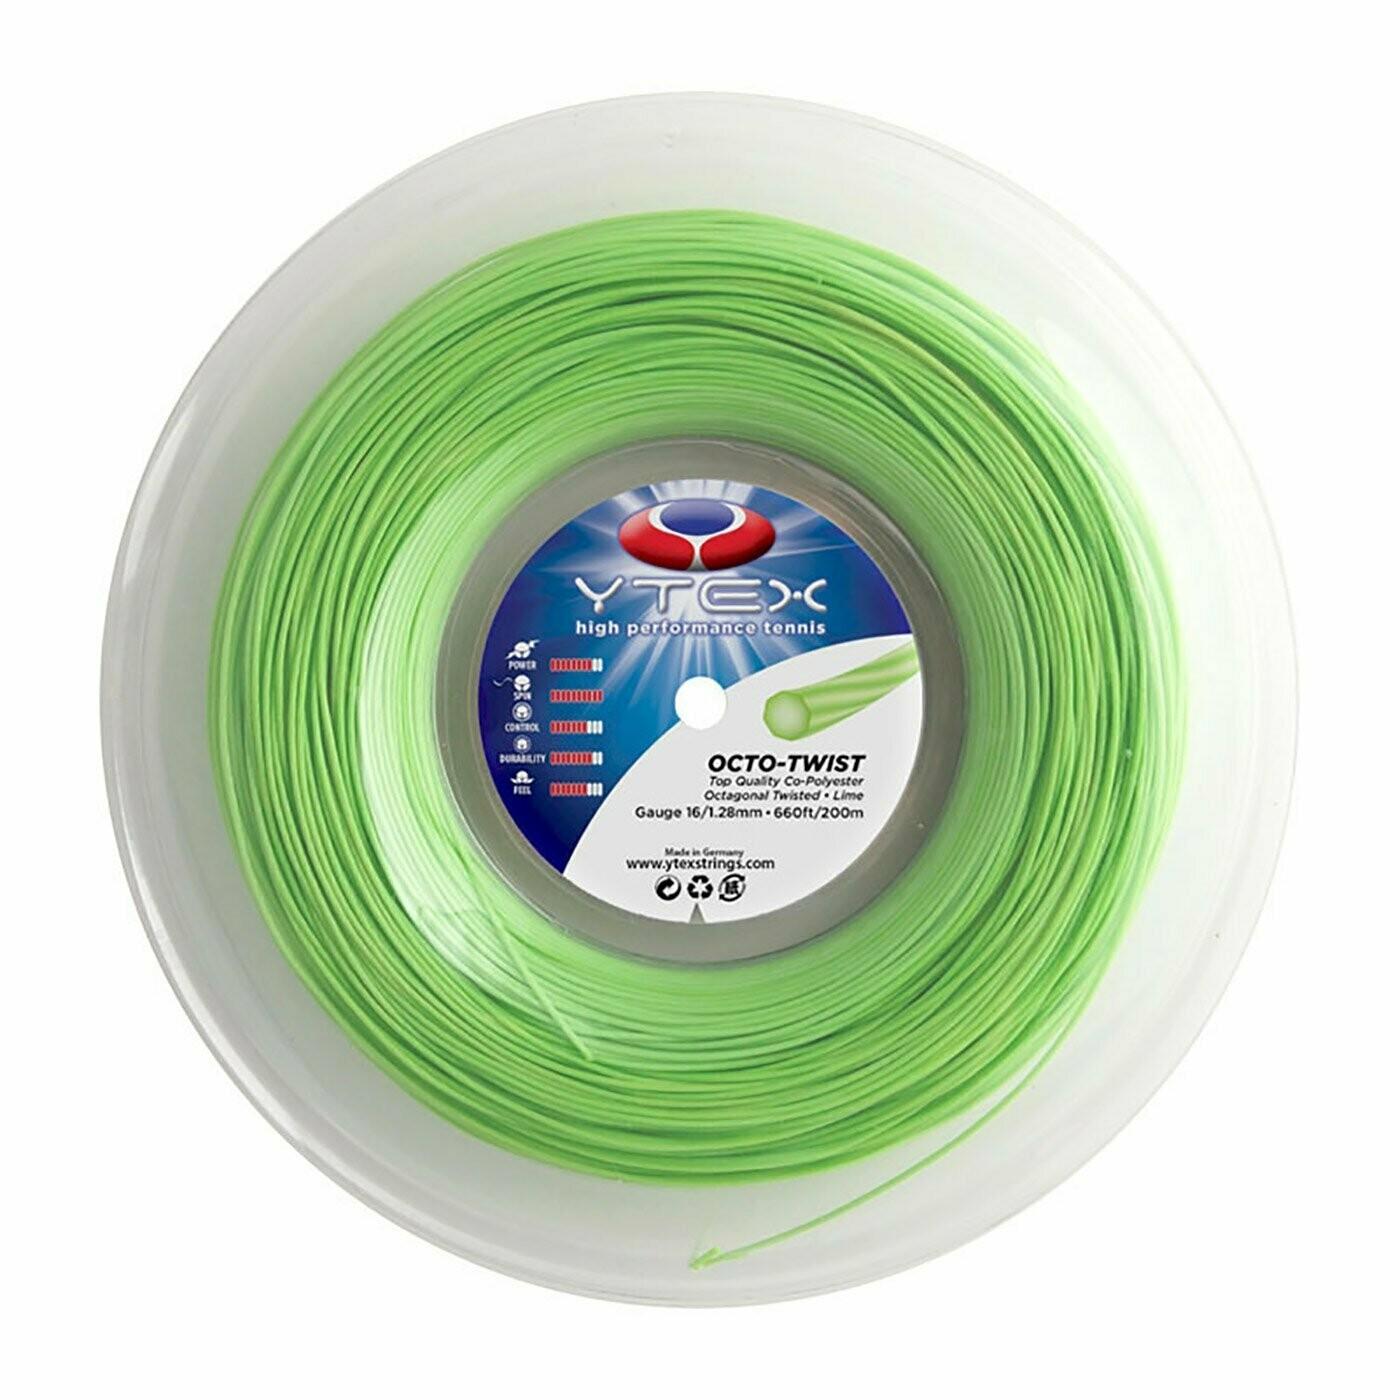 Ytex Octo Twist green